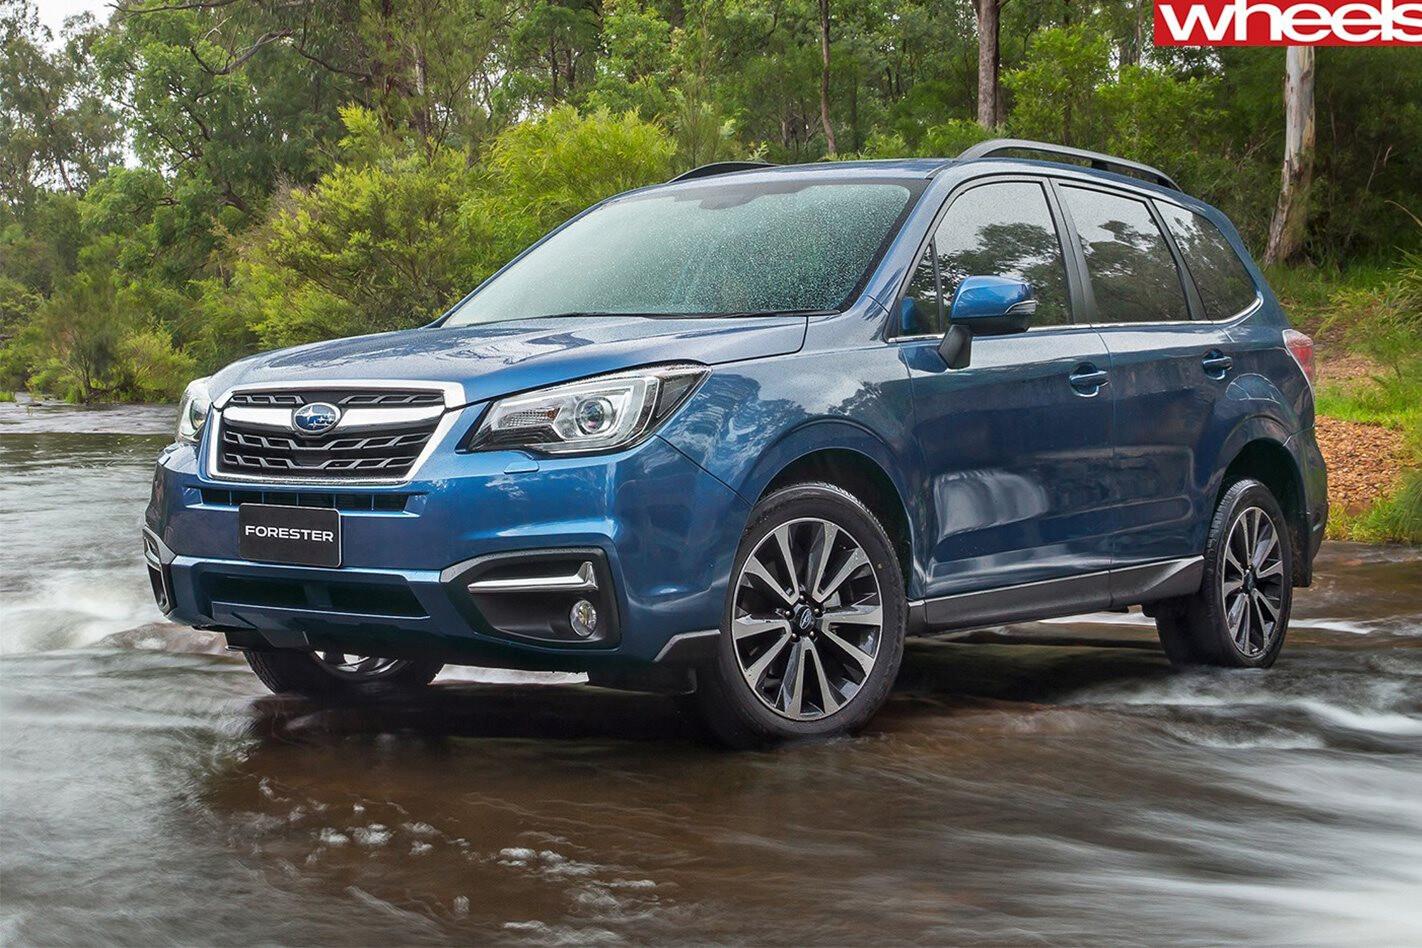 2016 Subaru Forester review